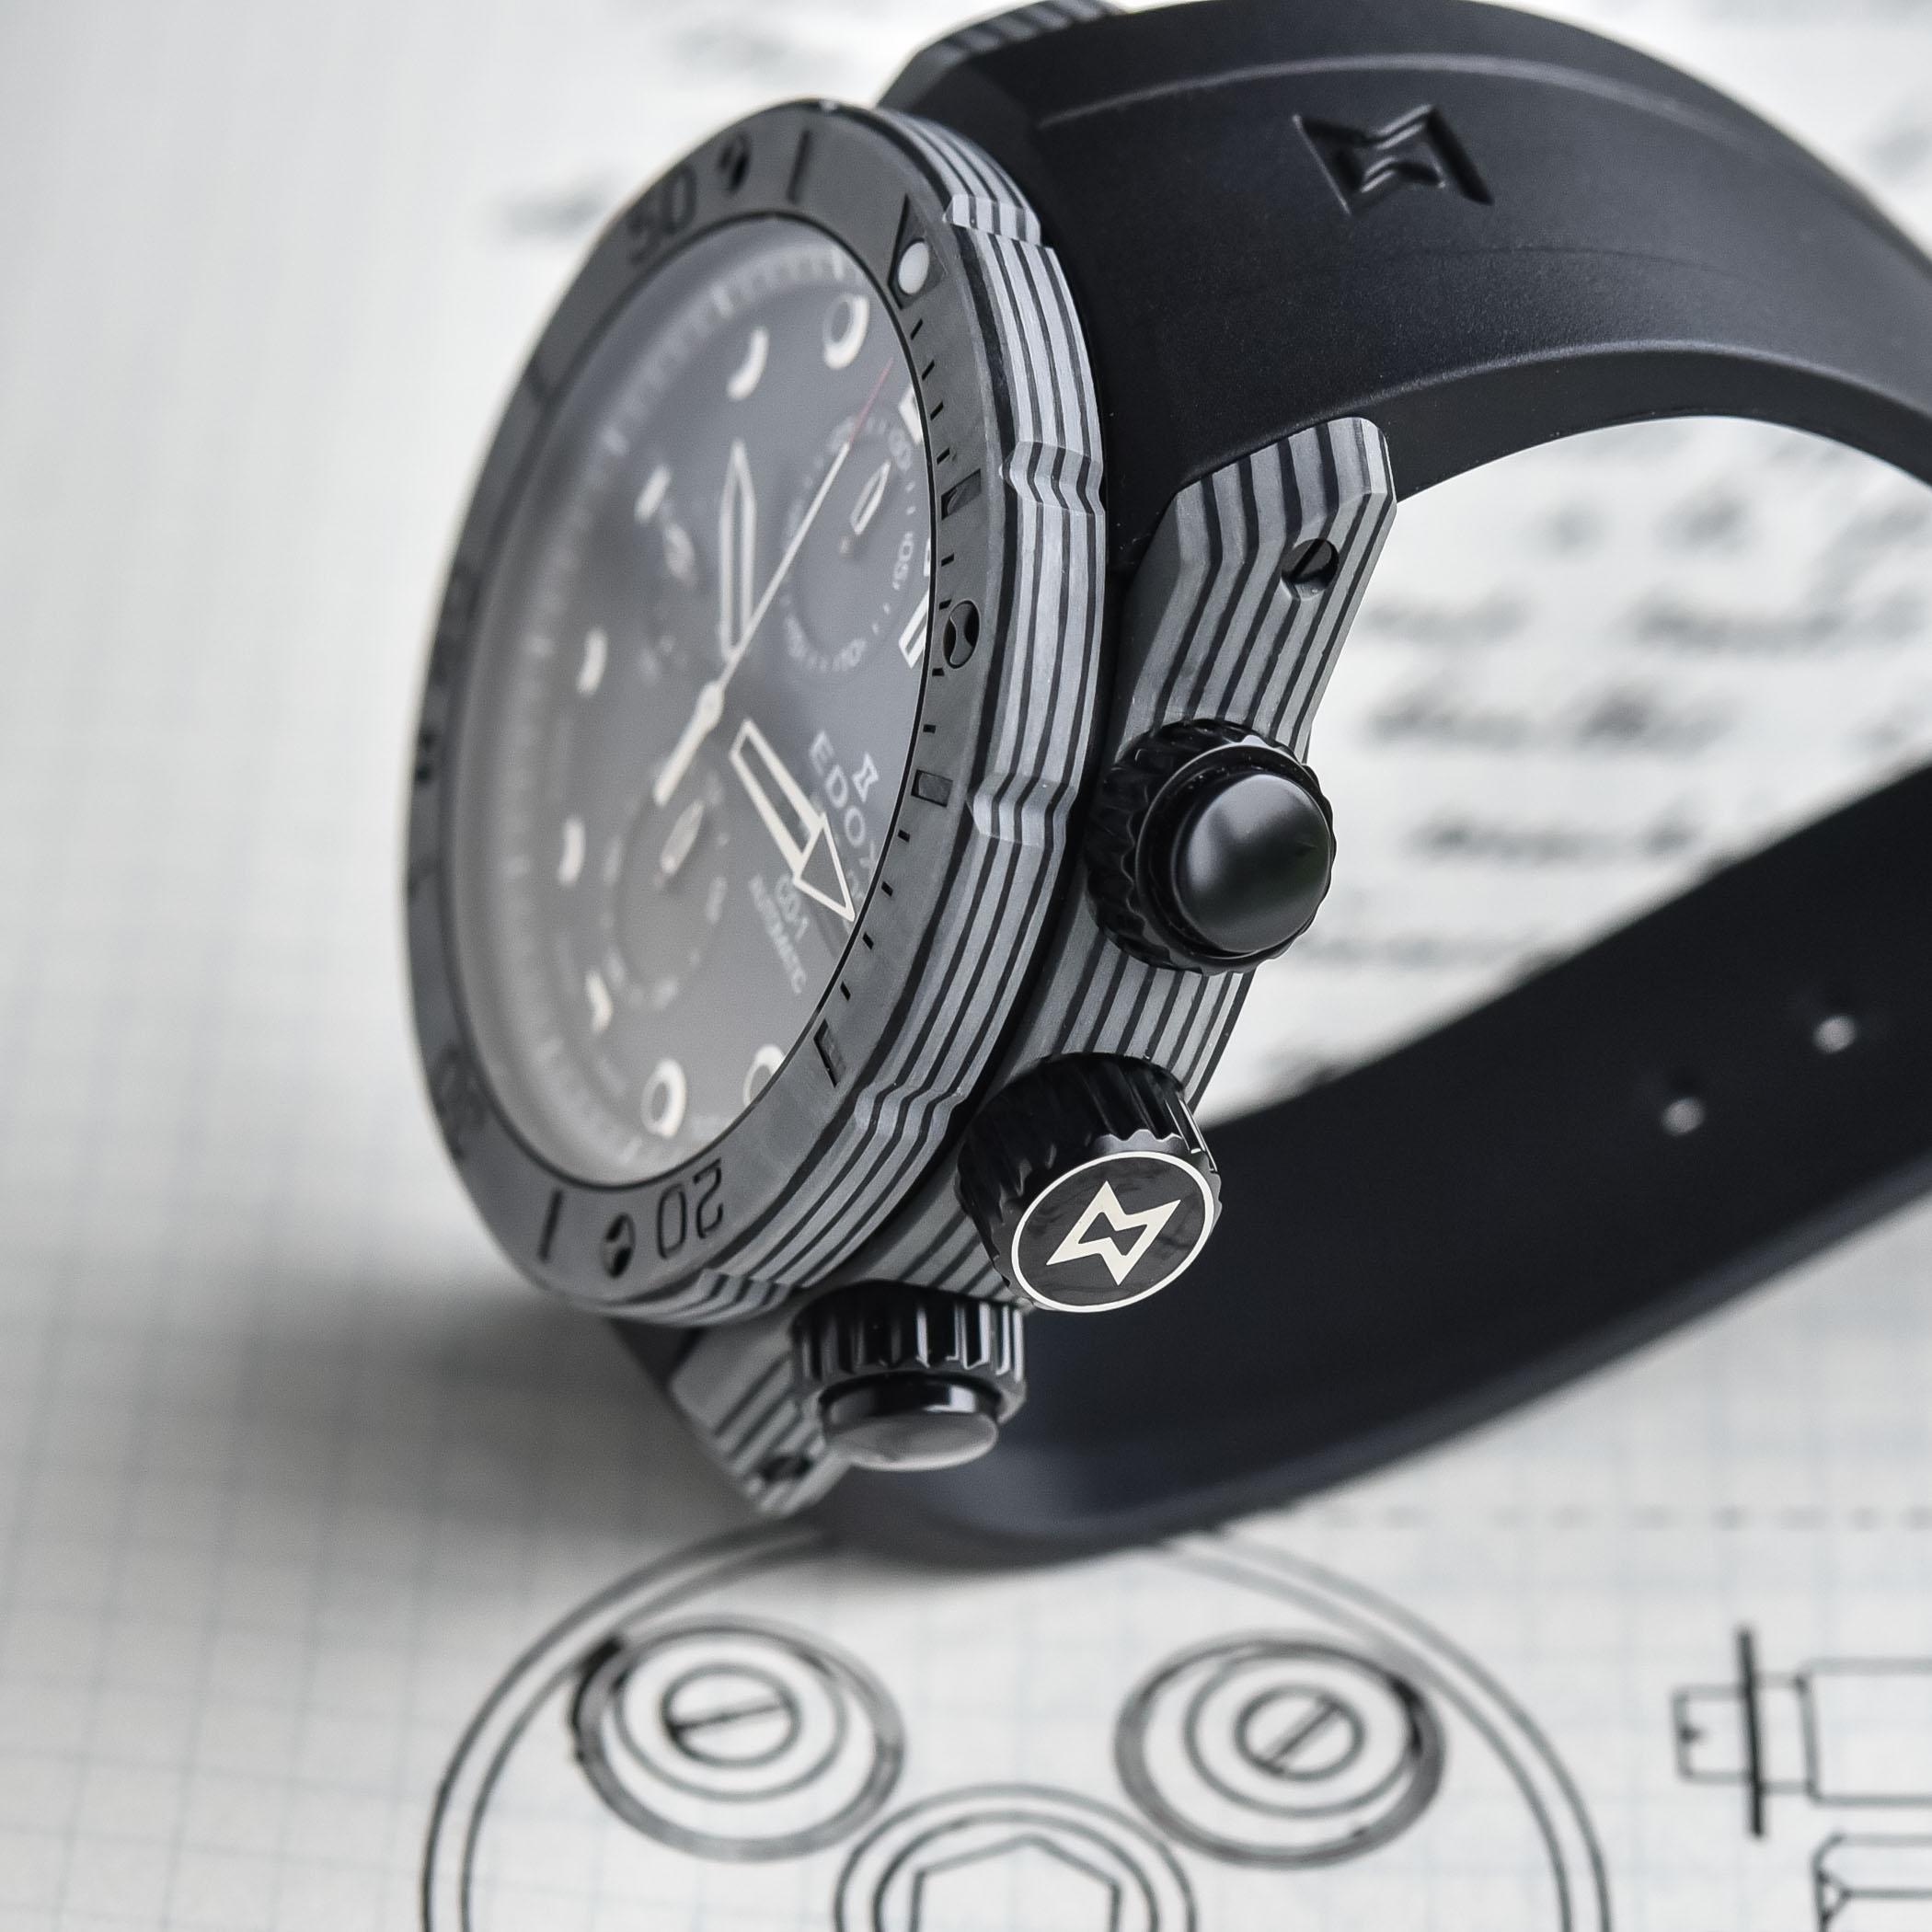 Edox CO-1 Carbon Chronograph Automatic